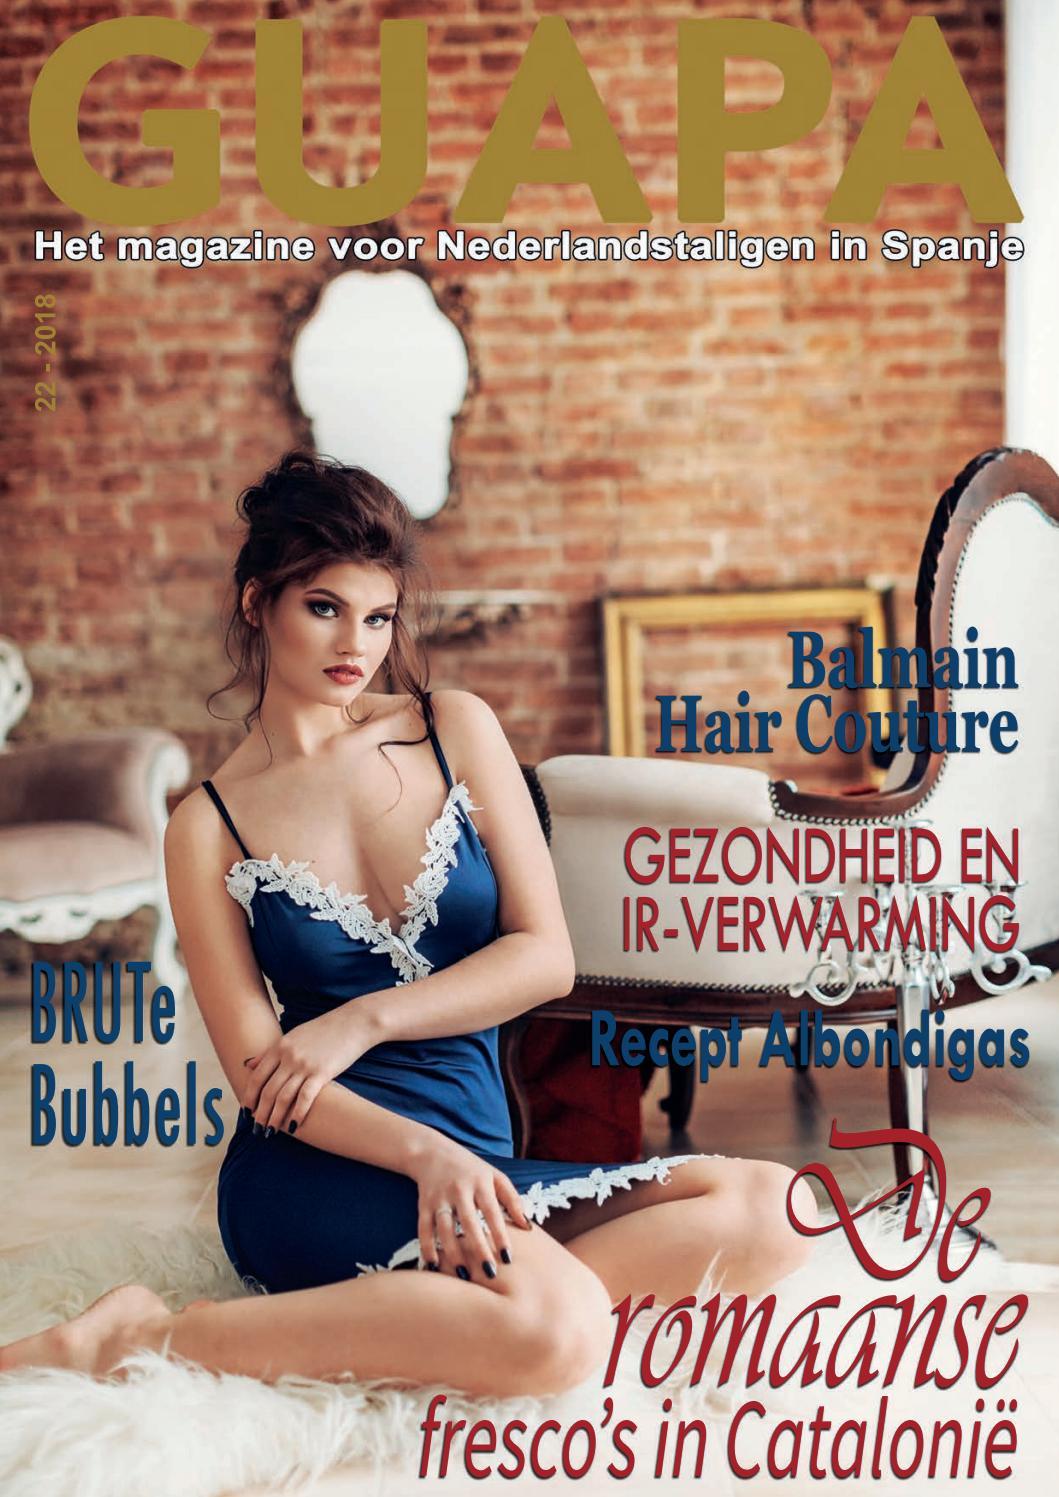 Guapa Magazine 22 - 2018 by Guapa Magazine - issuu